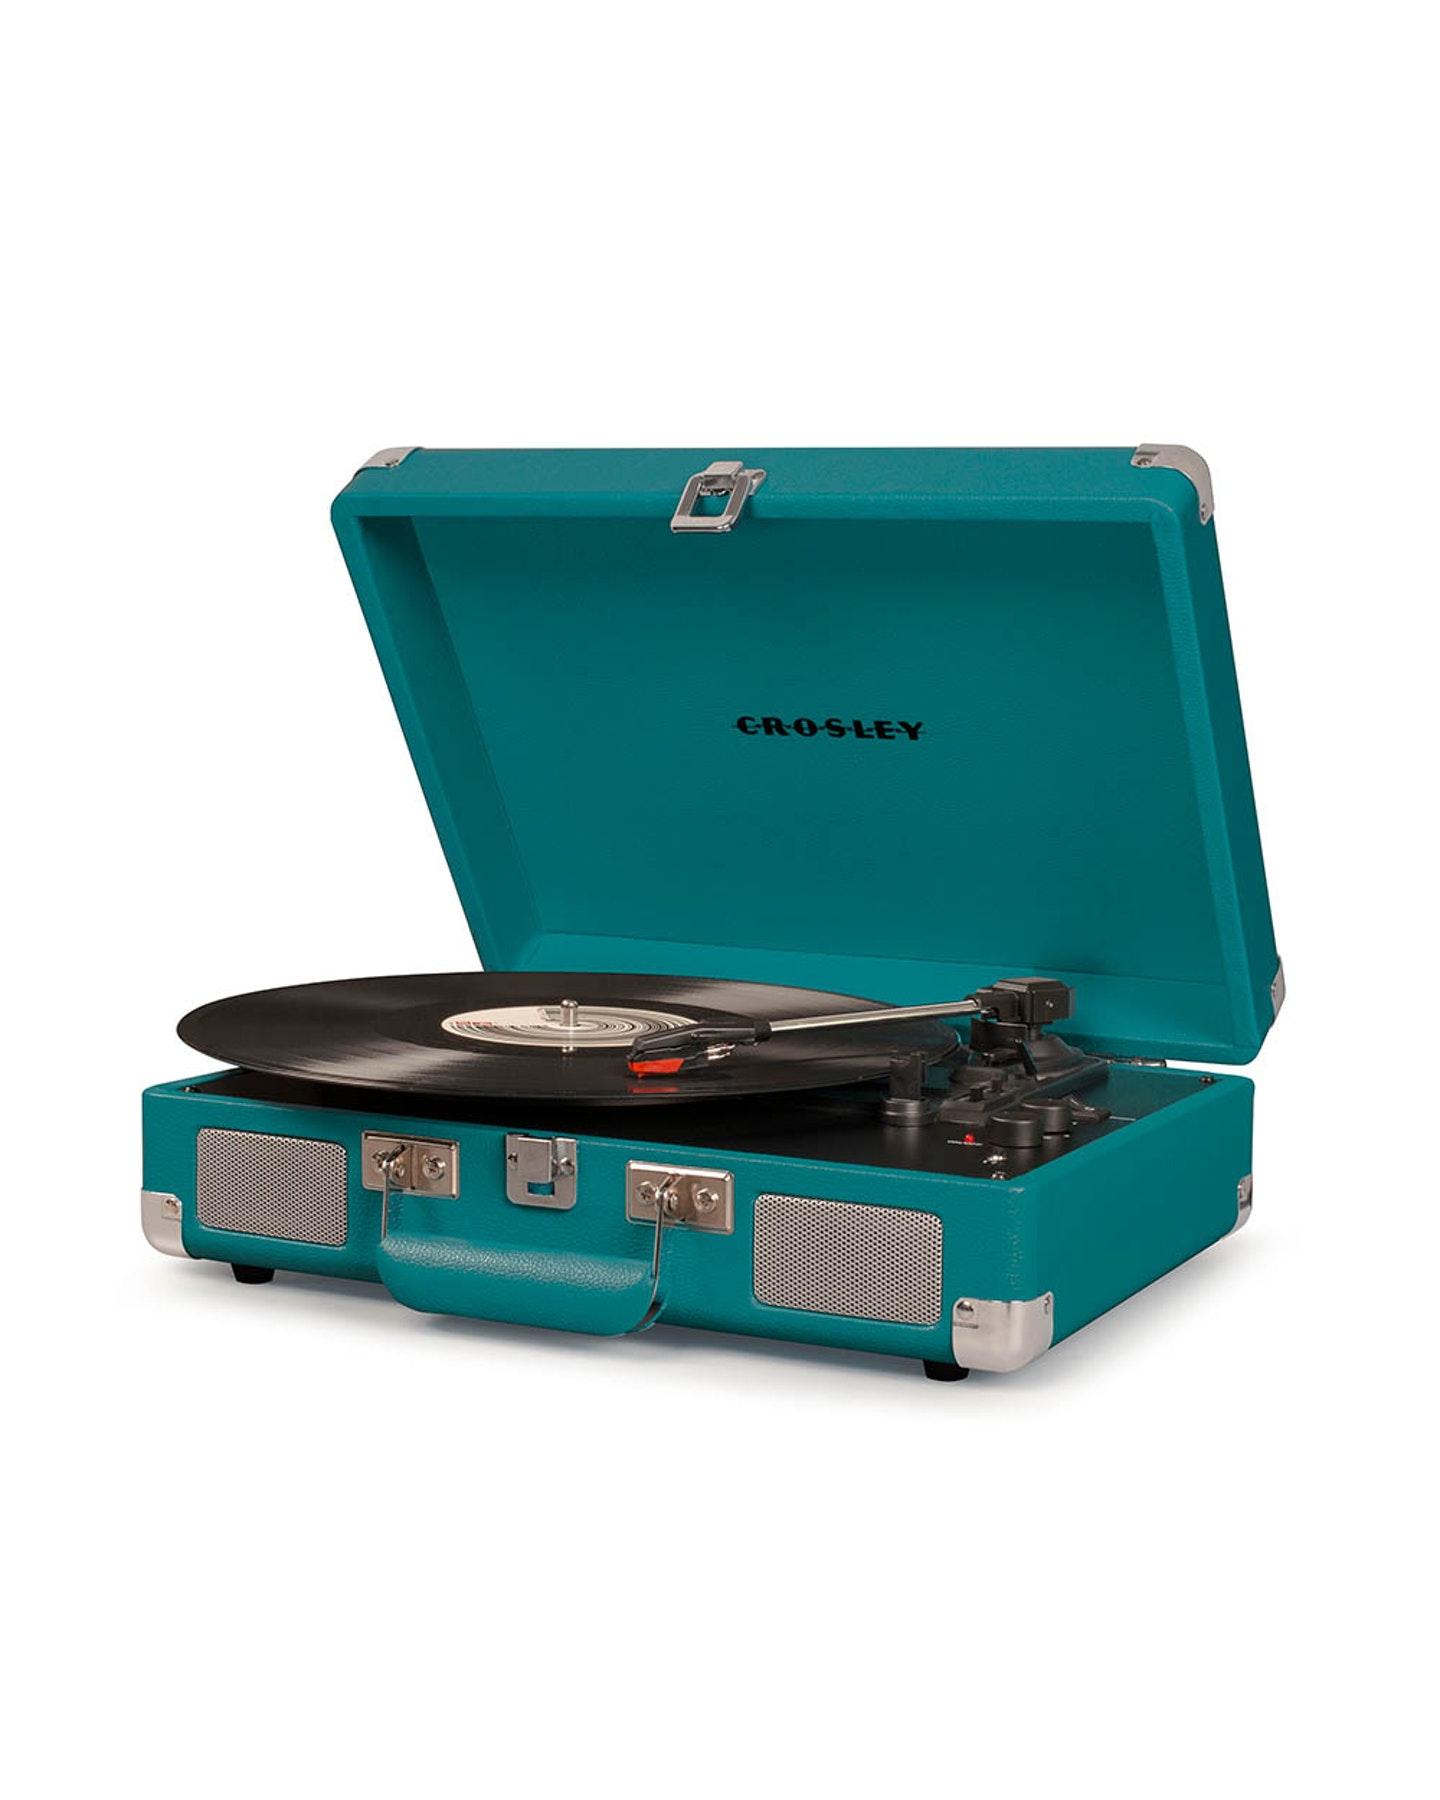 Crosley Crosley Cruiser Deluxe Portable Turntable Teal Teal